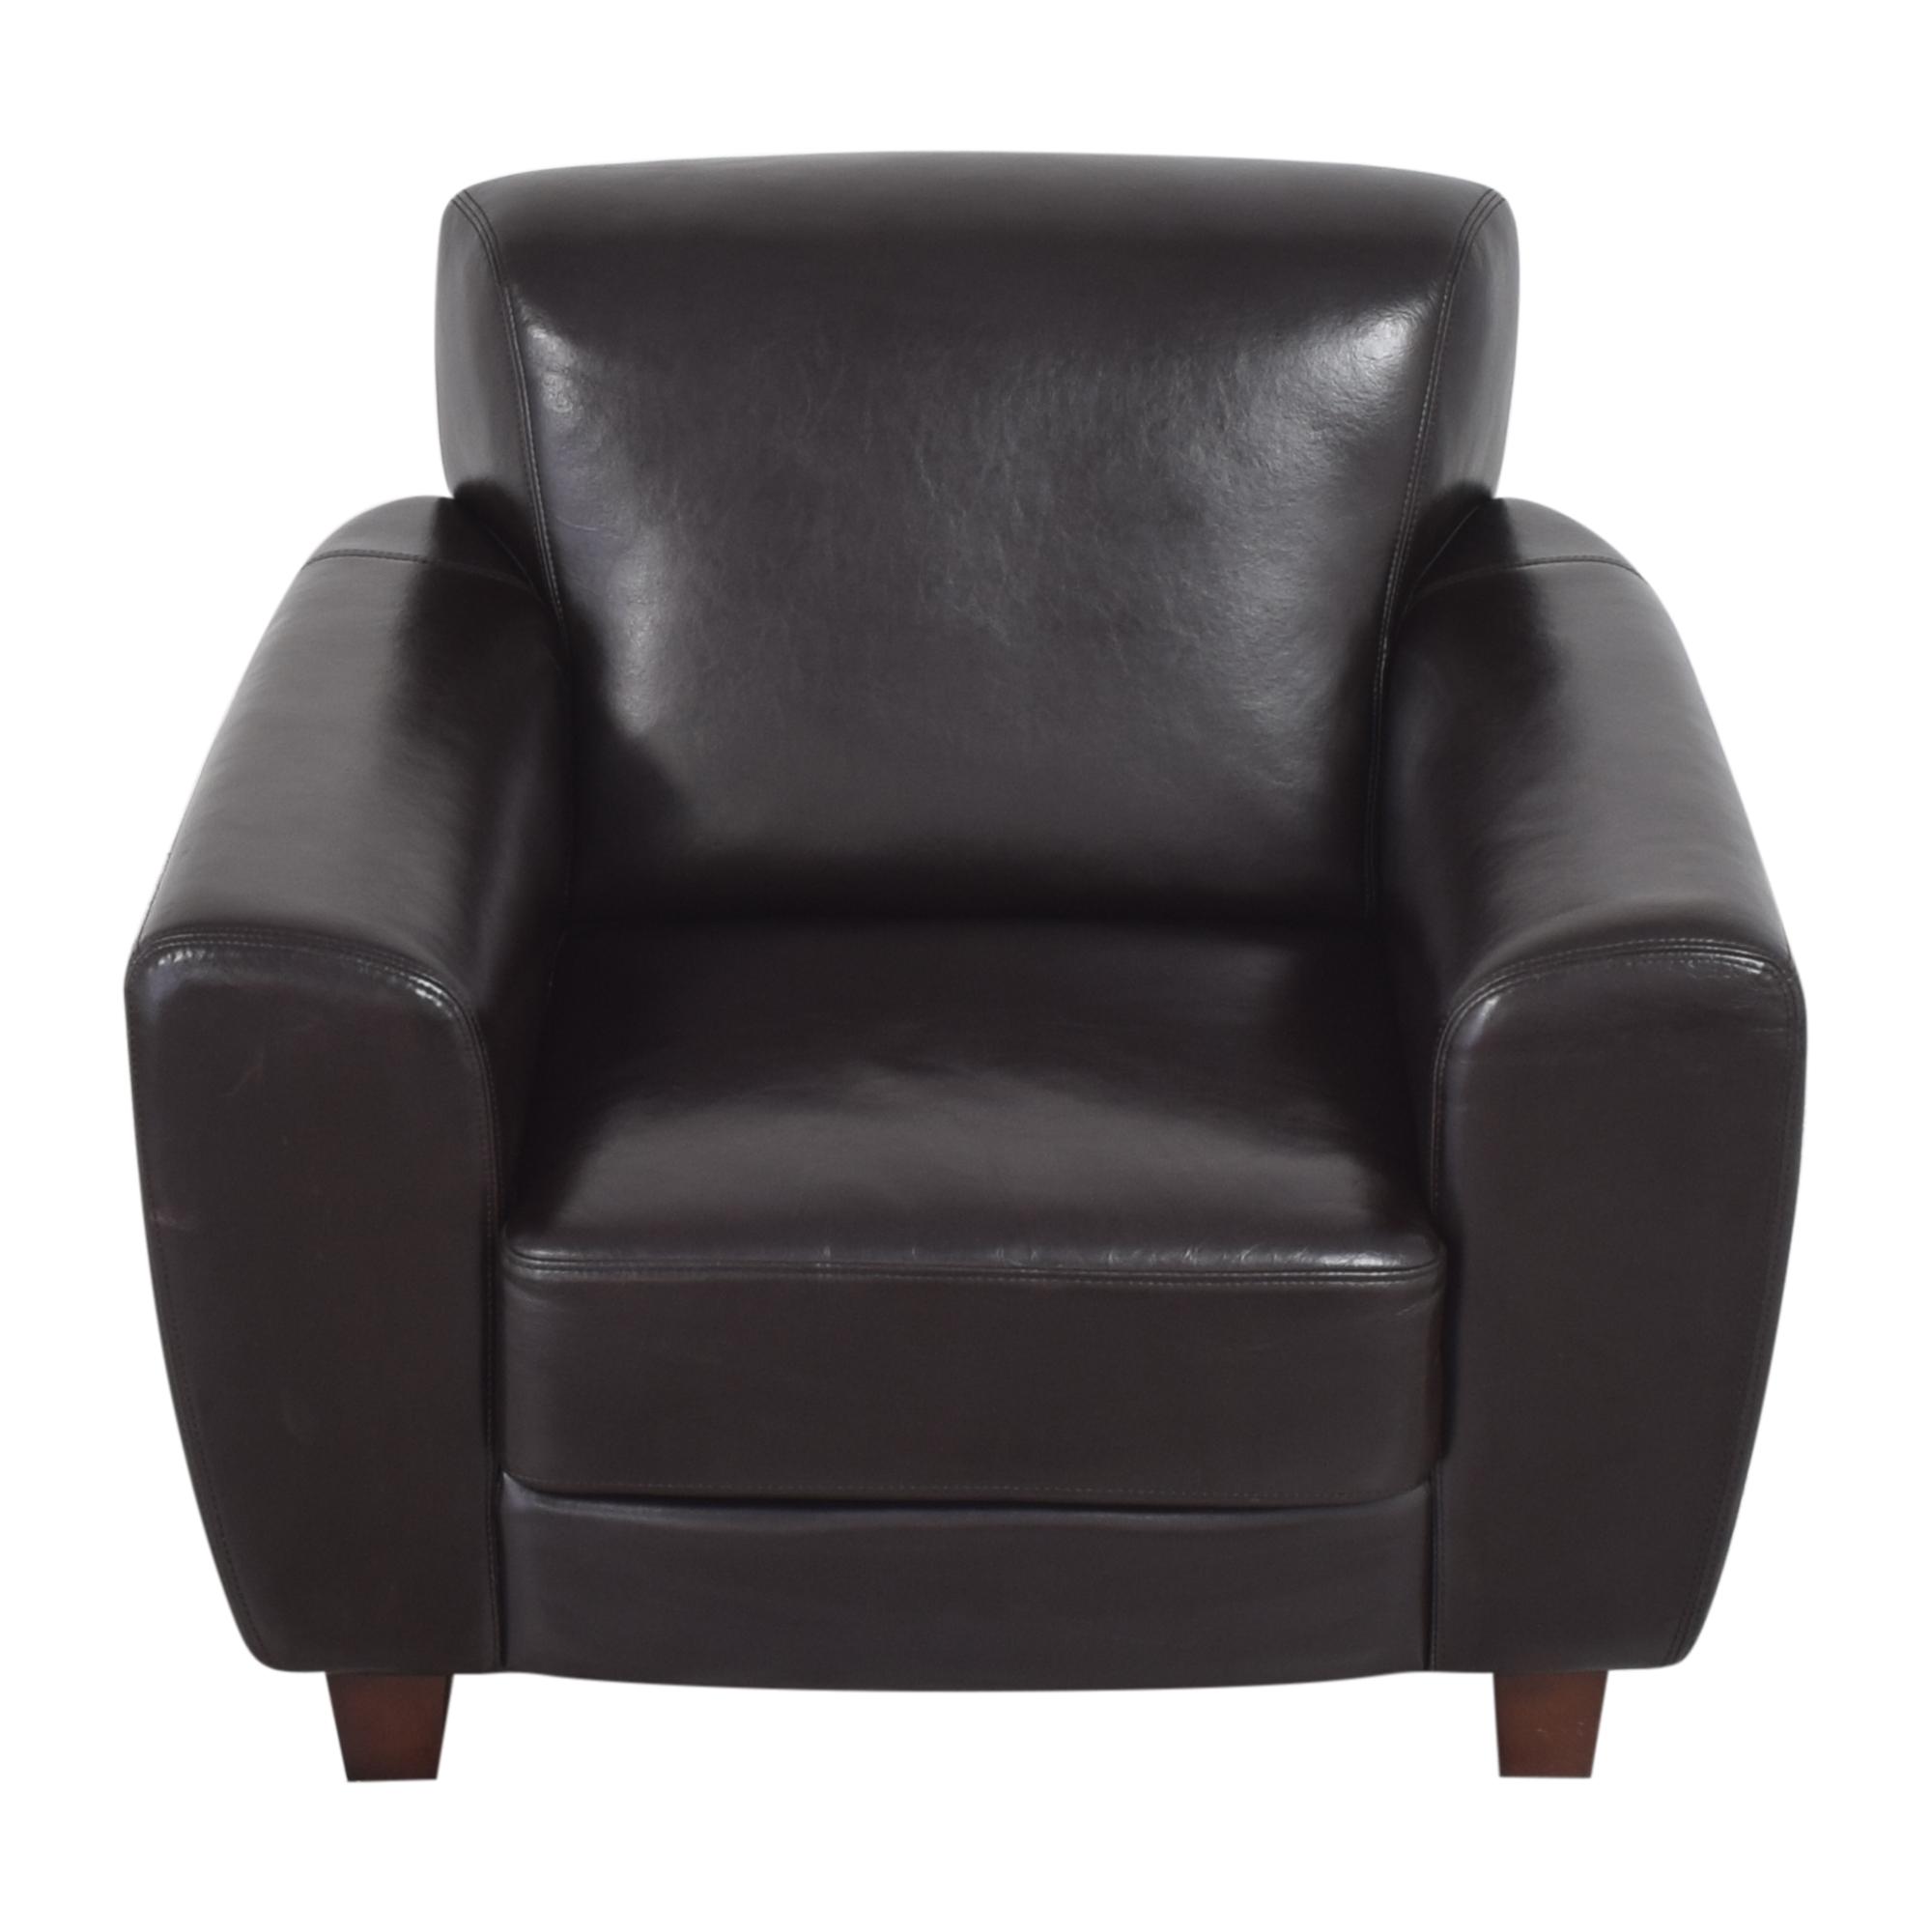 shop Beverly Hills Furniture Beverly Hills Furniture Accent Chair online